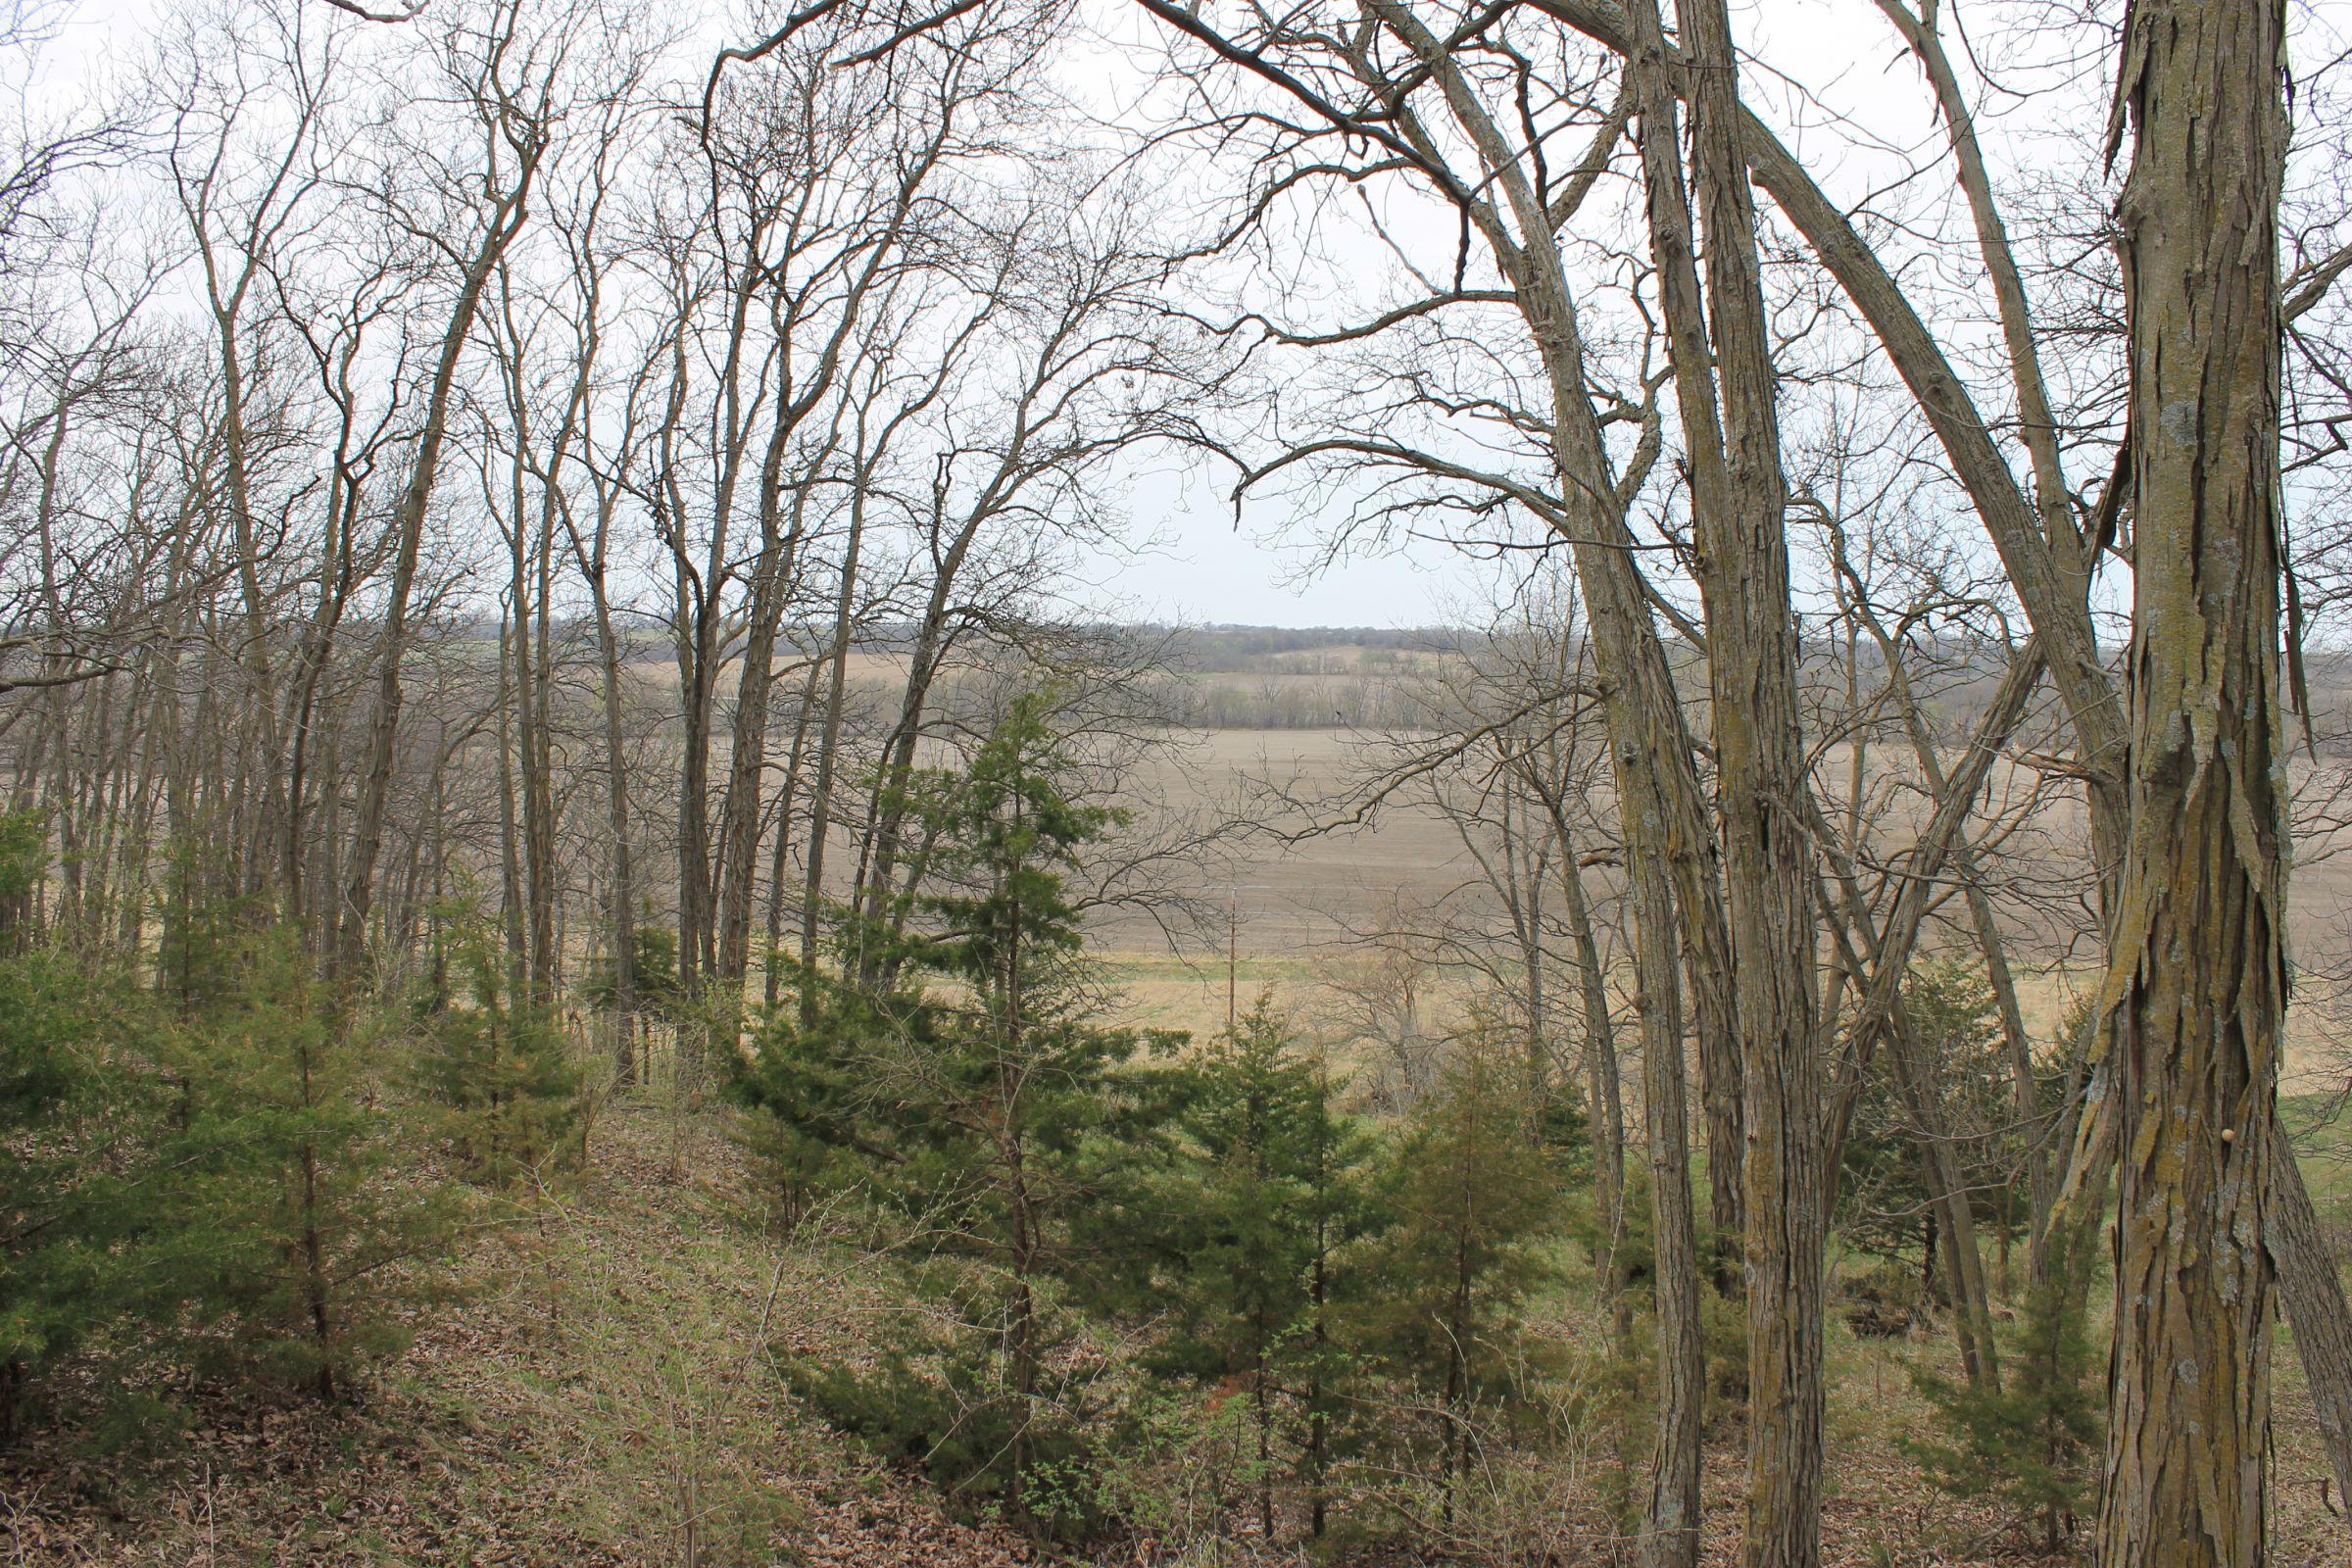 land-warren-county-iowa-186-acres-listing-number-15447-4-2021-04-09-154347.JPG